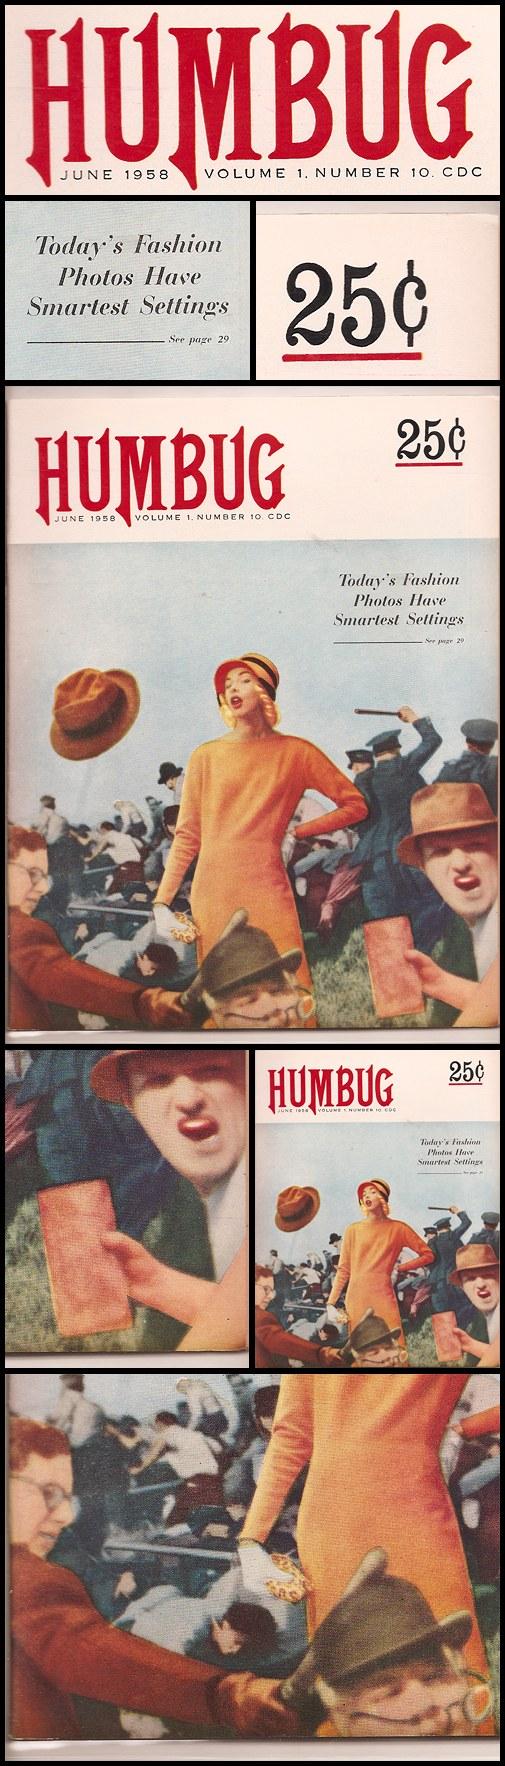 40. Humbug #10: File Copy (Jun 1958)